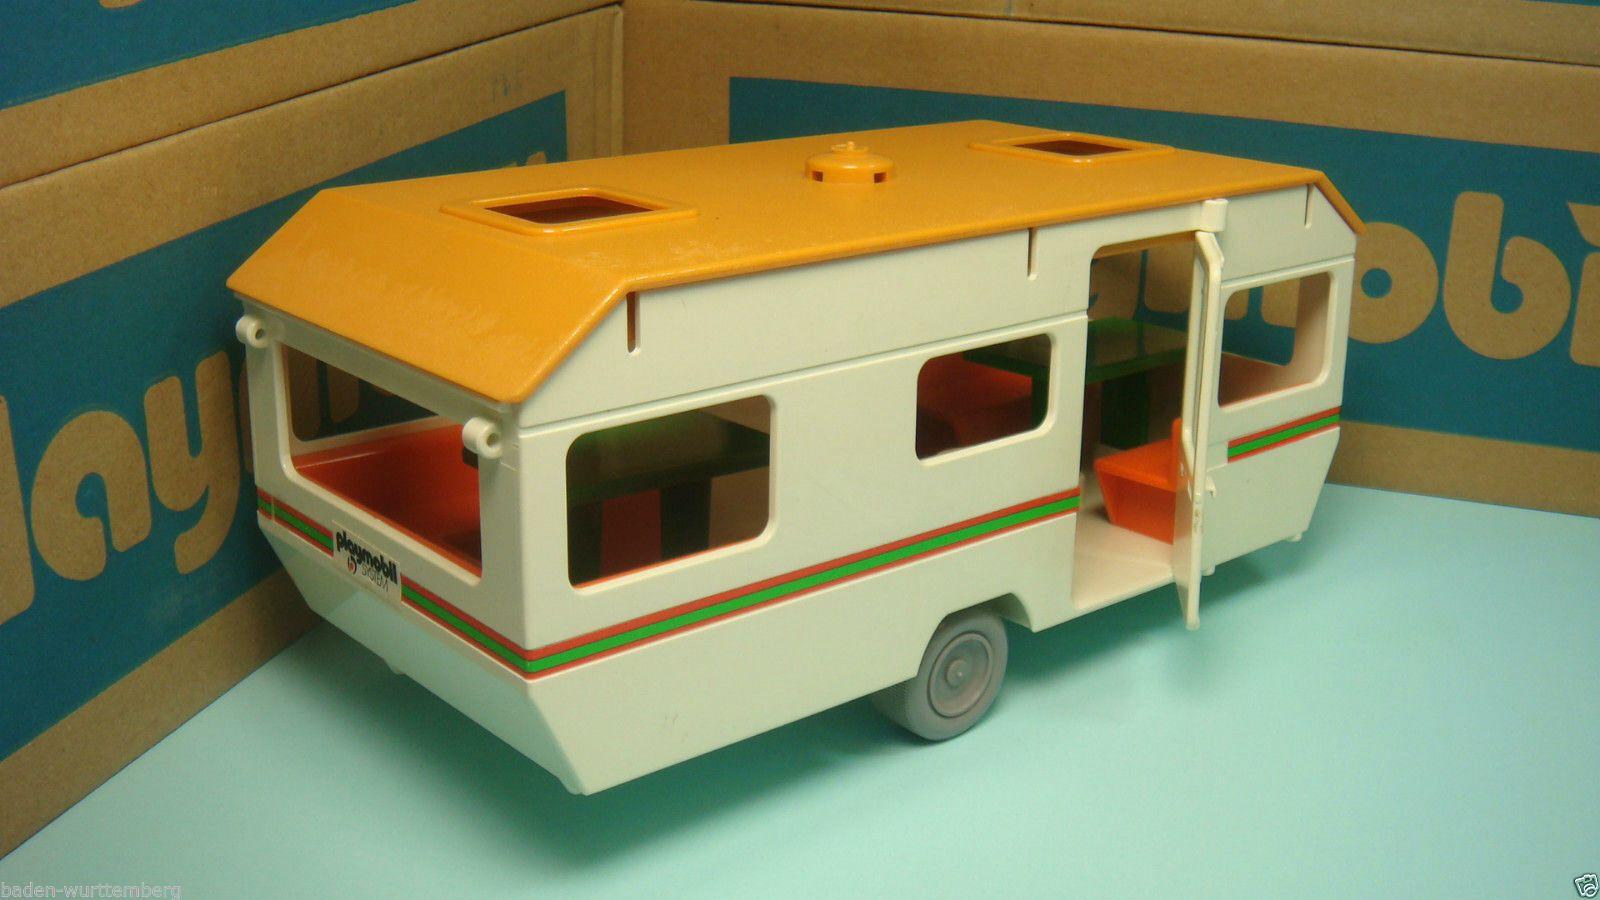 Playmobil vintage trailer camper playmobil pinterest - Camping car playmobil pas cher ...